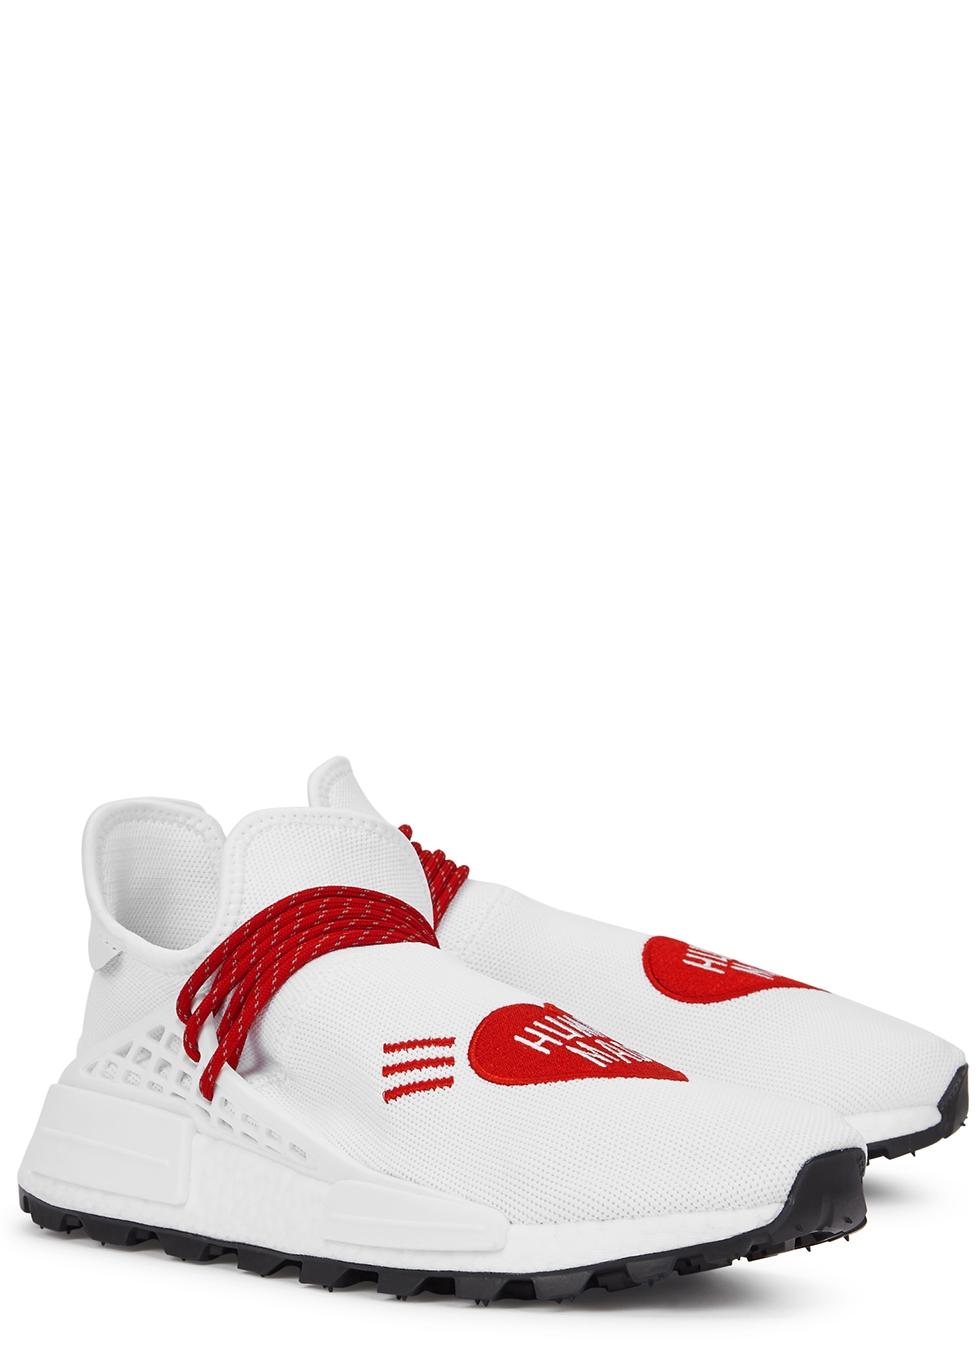 Sneakers femme Adidas NMD (©footlockereu) | Feeds and pdp